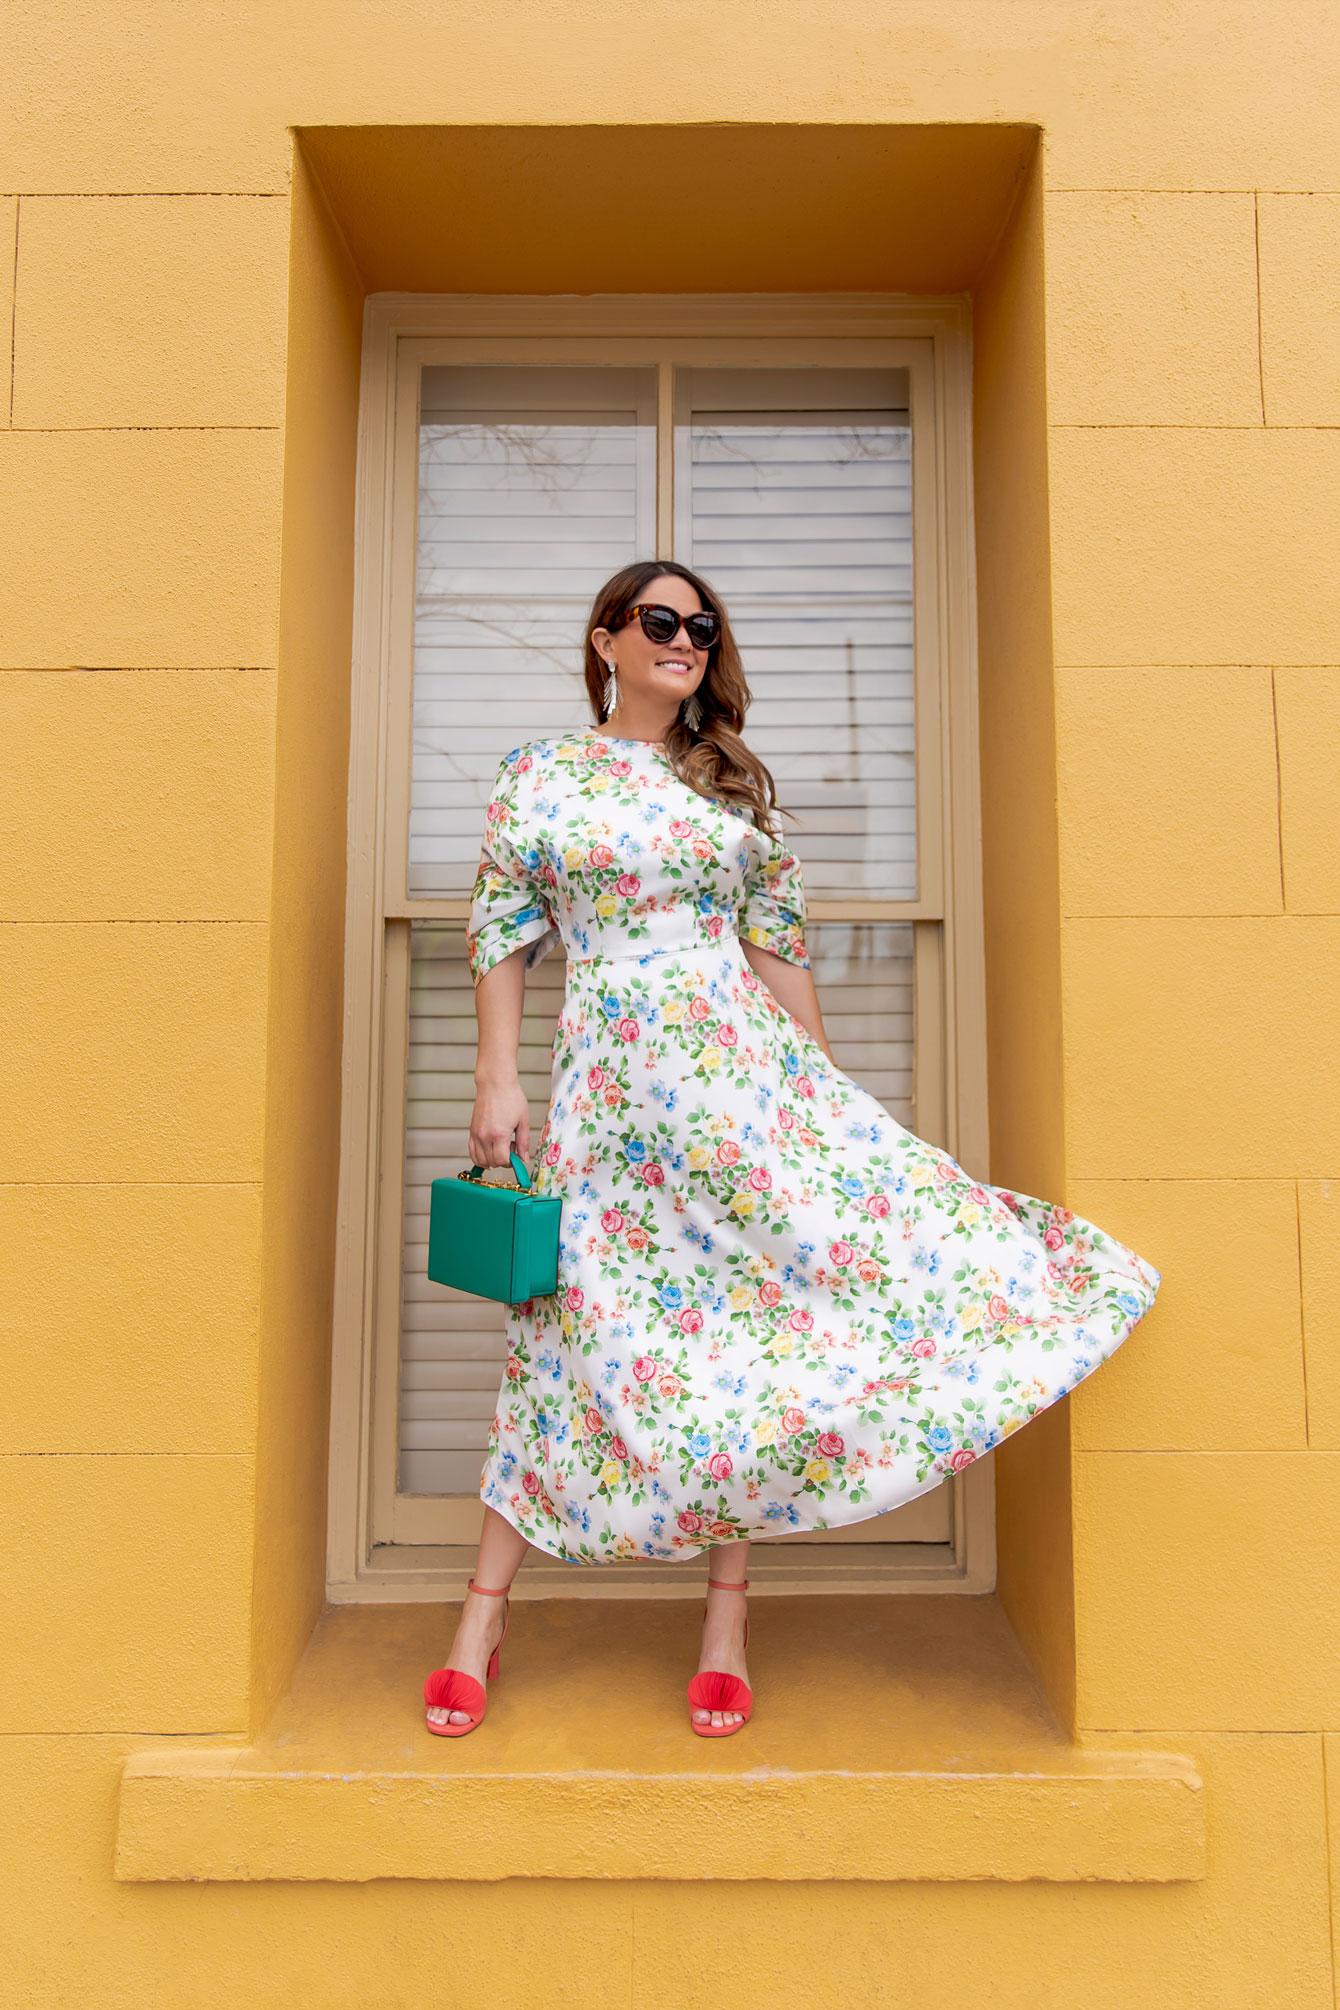 Emilia Wickstead Floral Dress